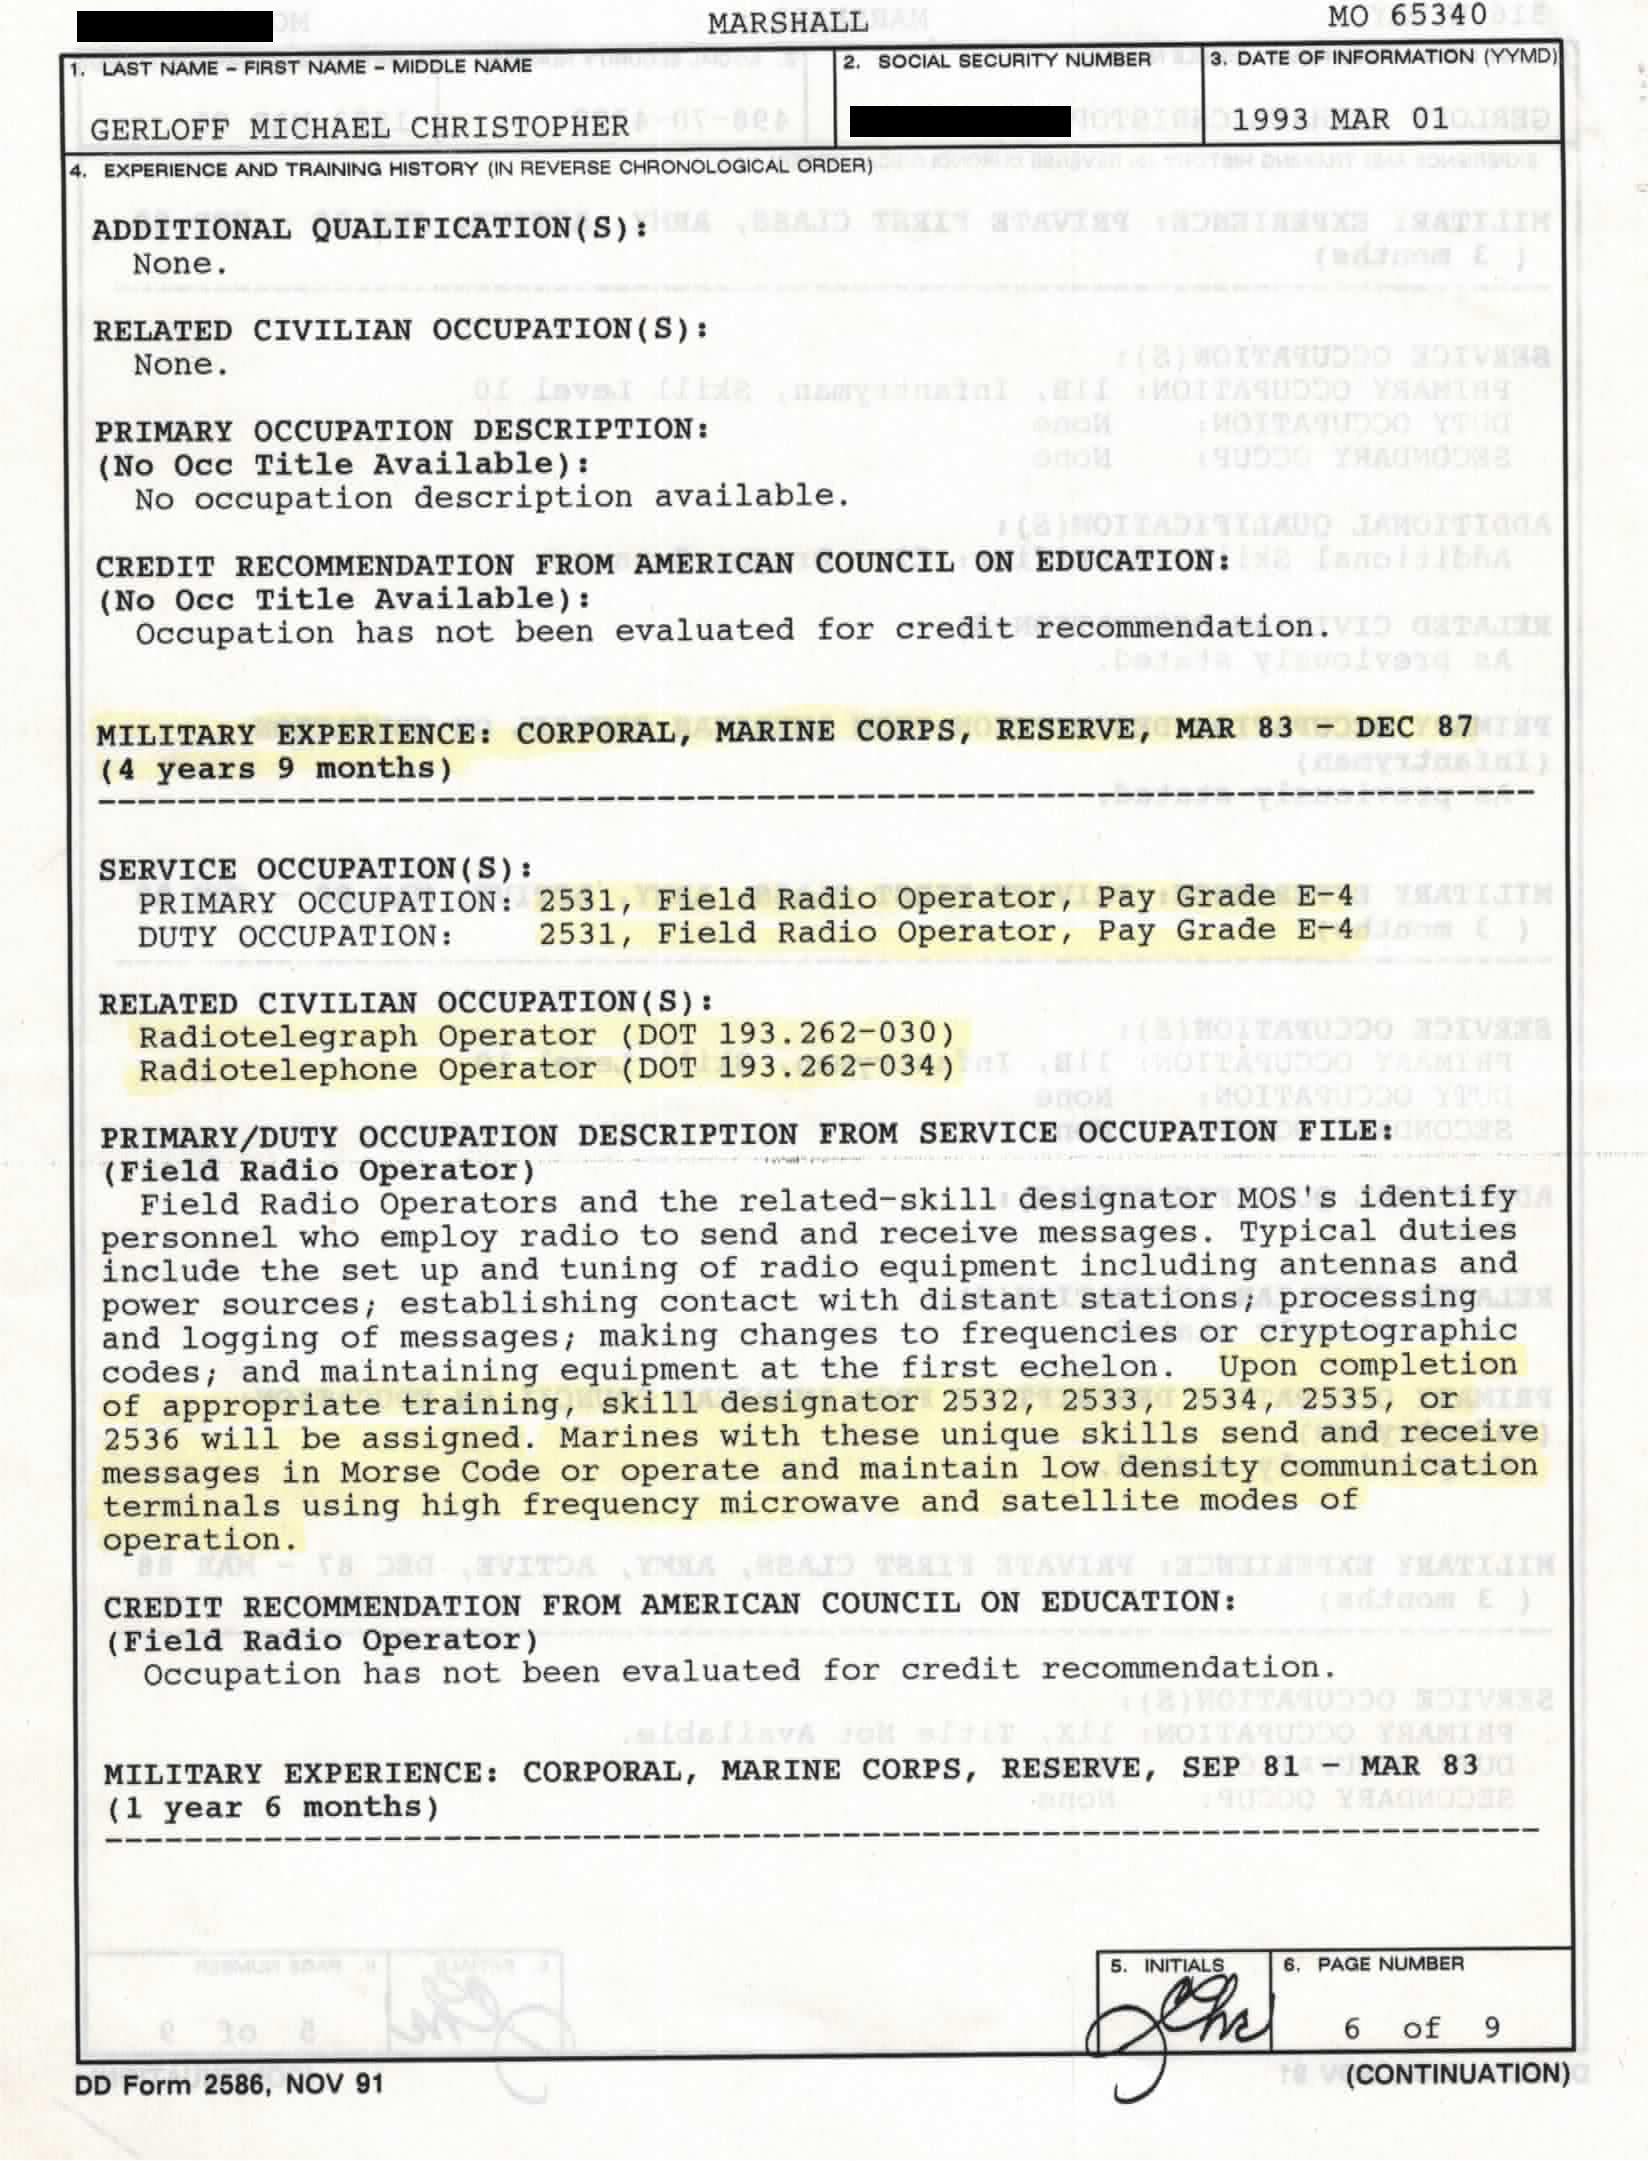 Dd Form 2586 Vmet Document Ddform2586 Fill Online Printable ...